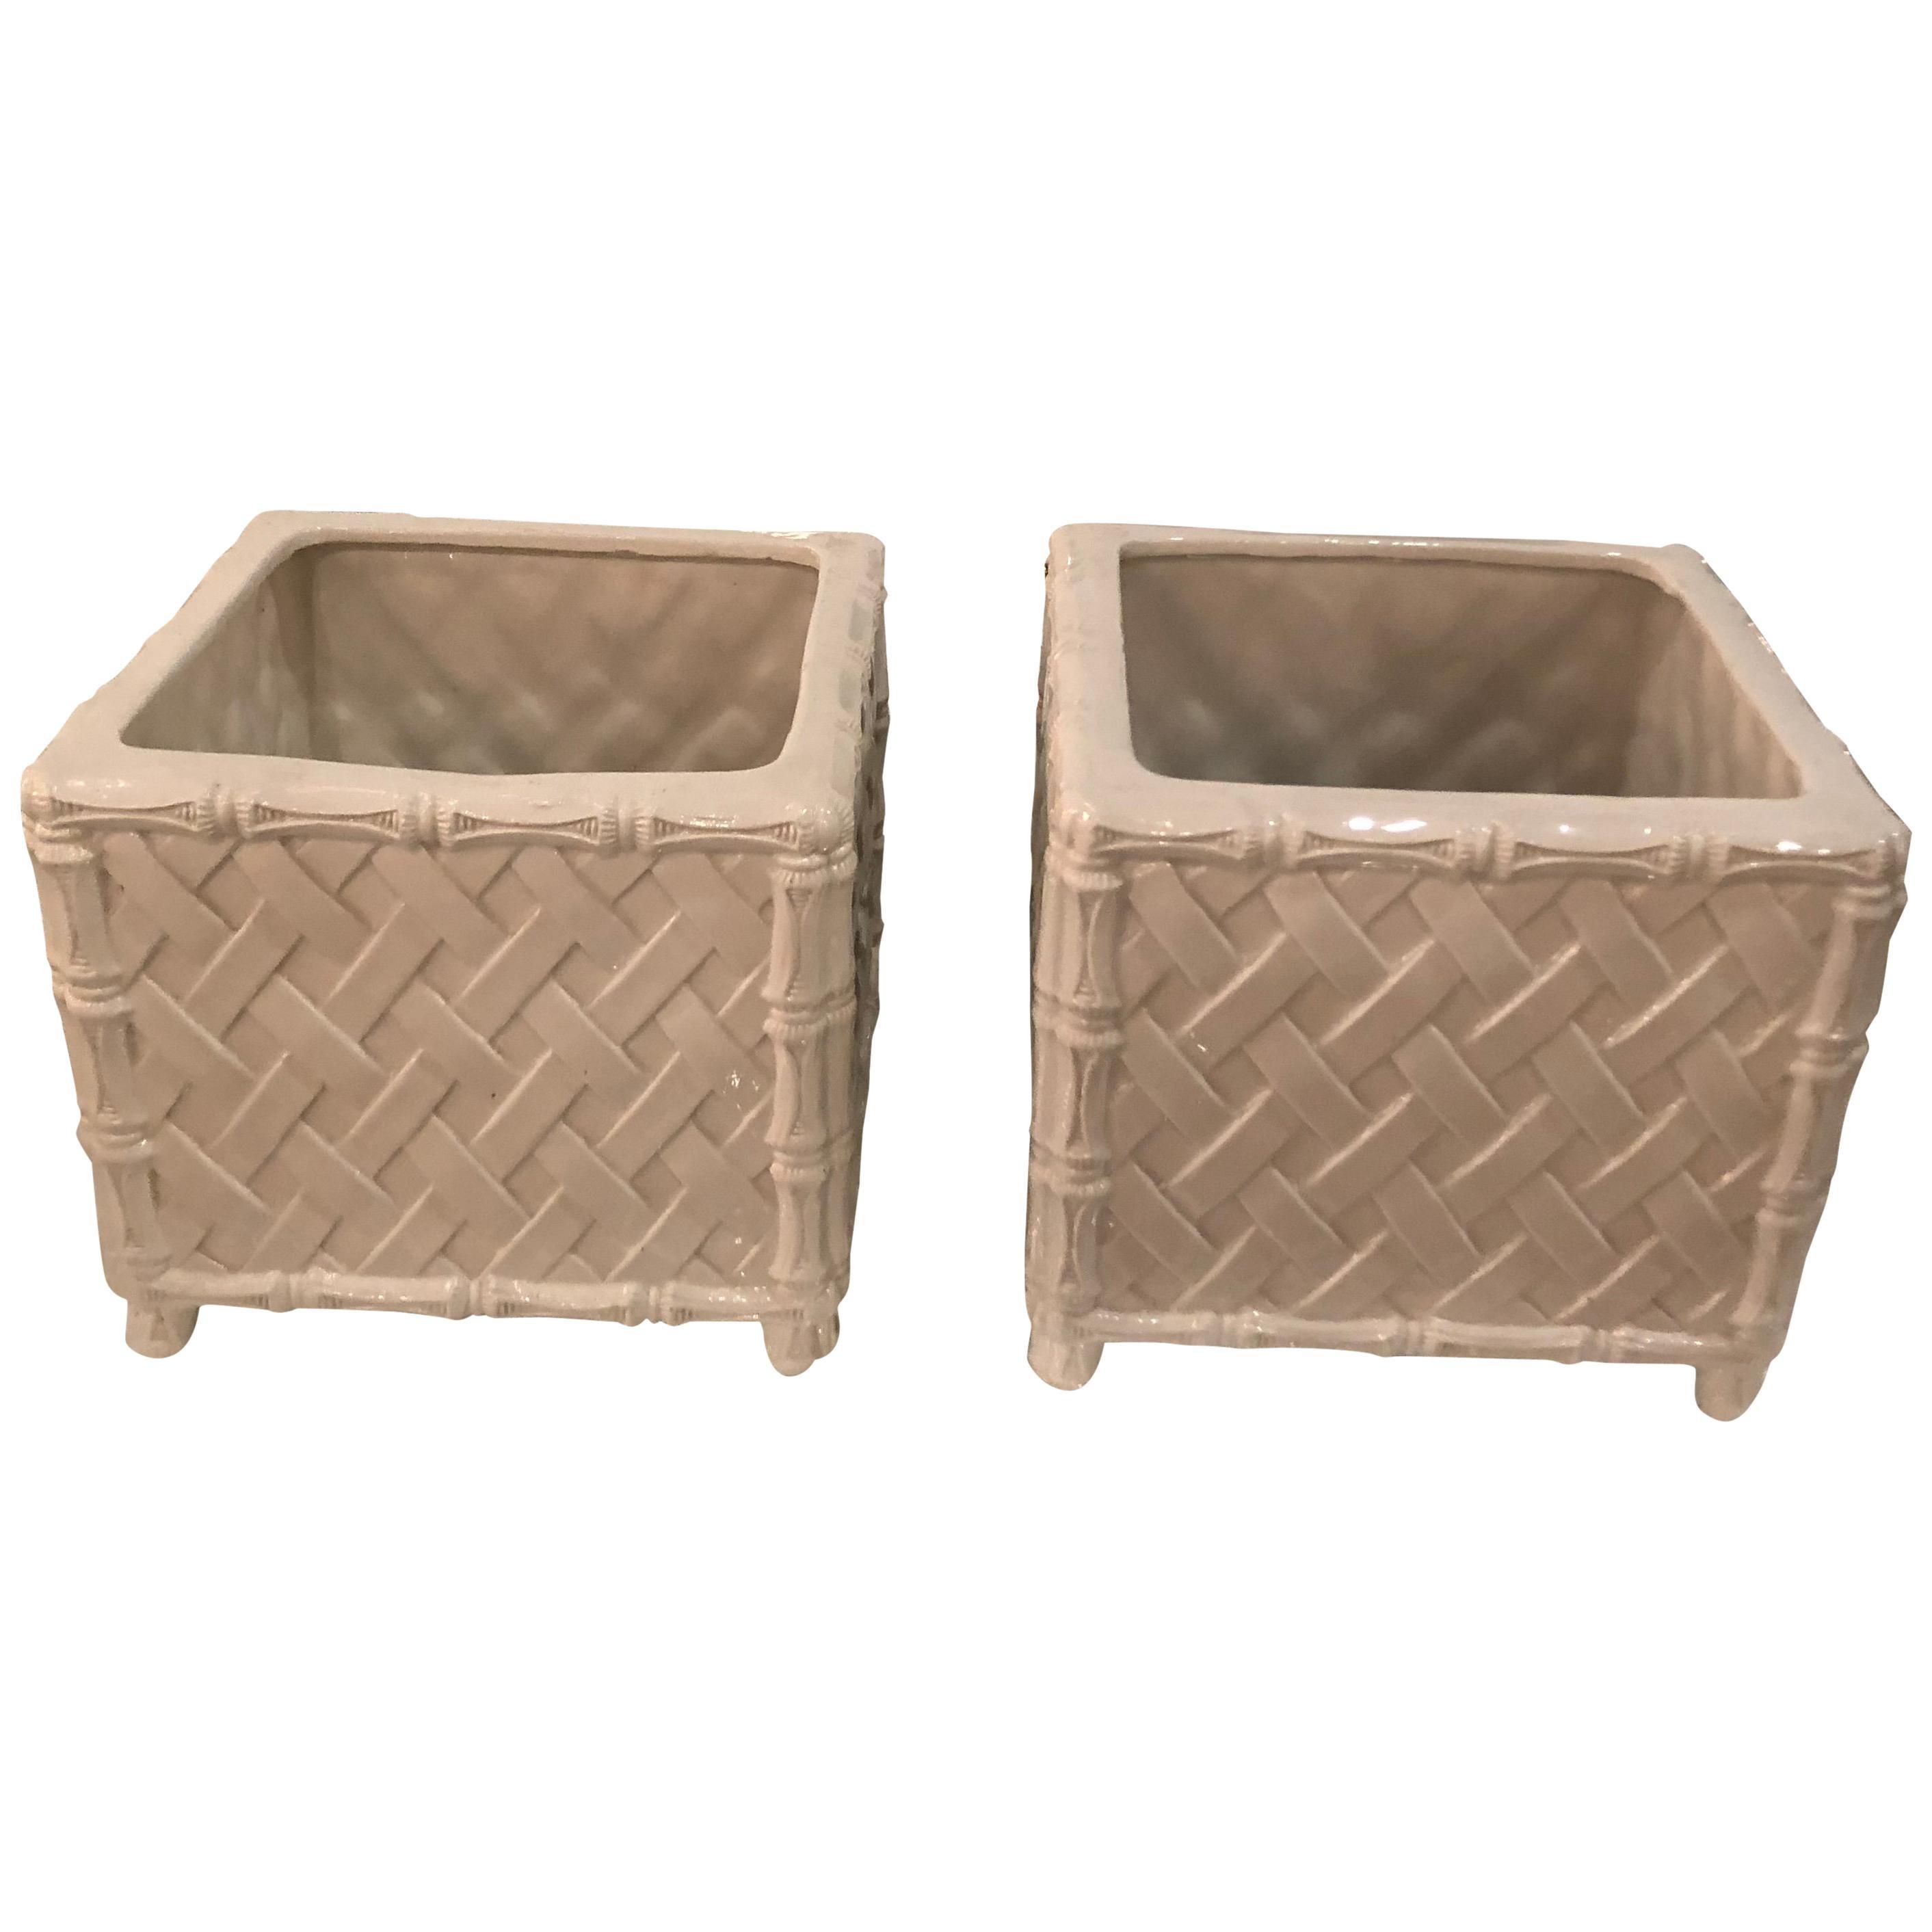 Pair of Vintage Italian Nora Fenton Numbered Bamboo Ceramic Planters Pots